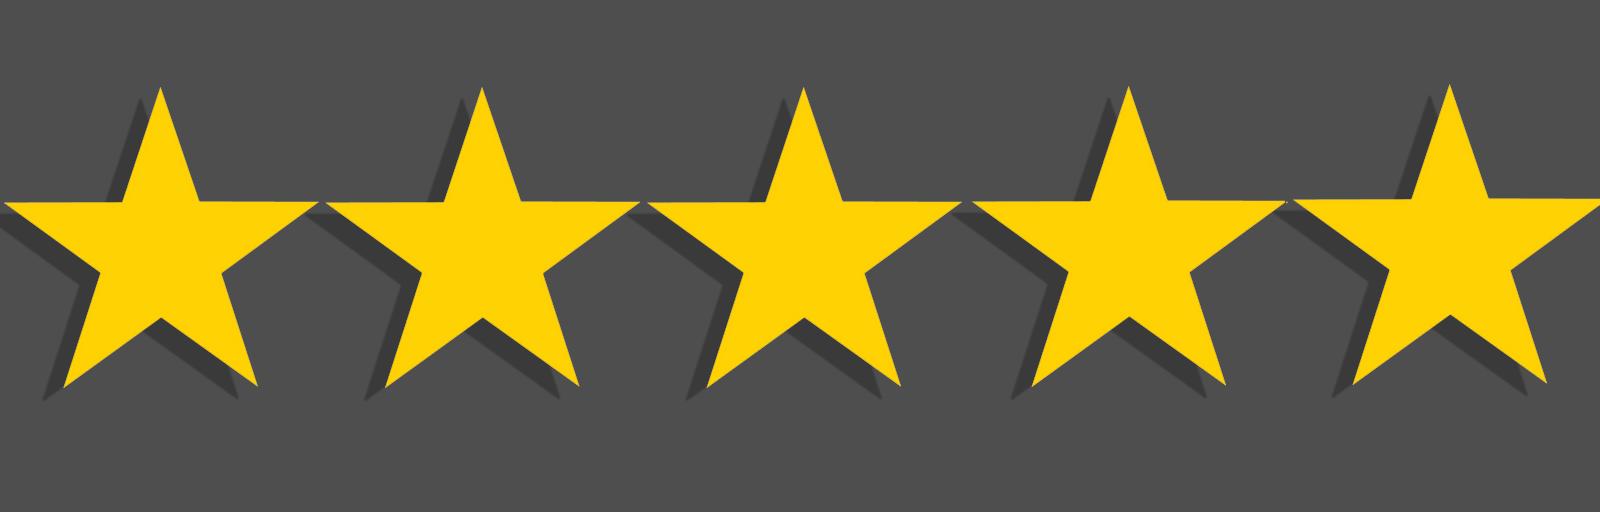 5-stars-grey.png